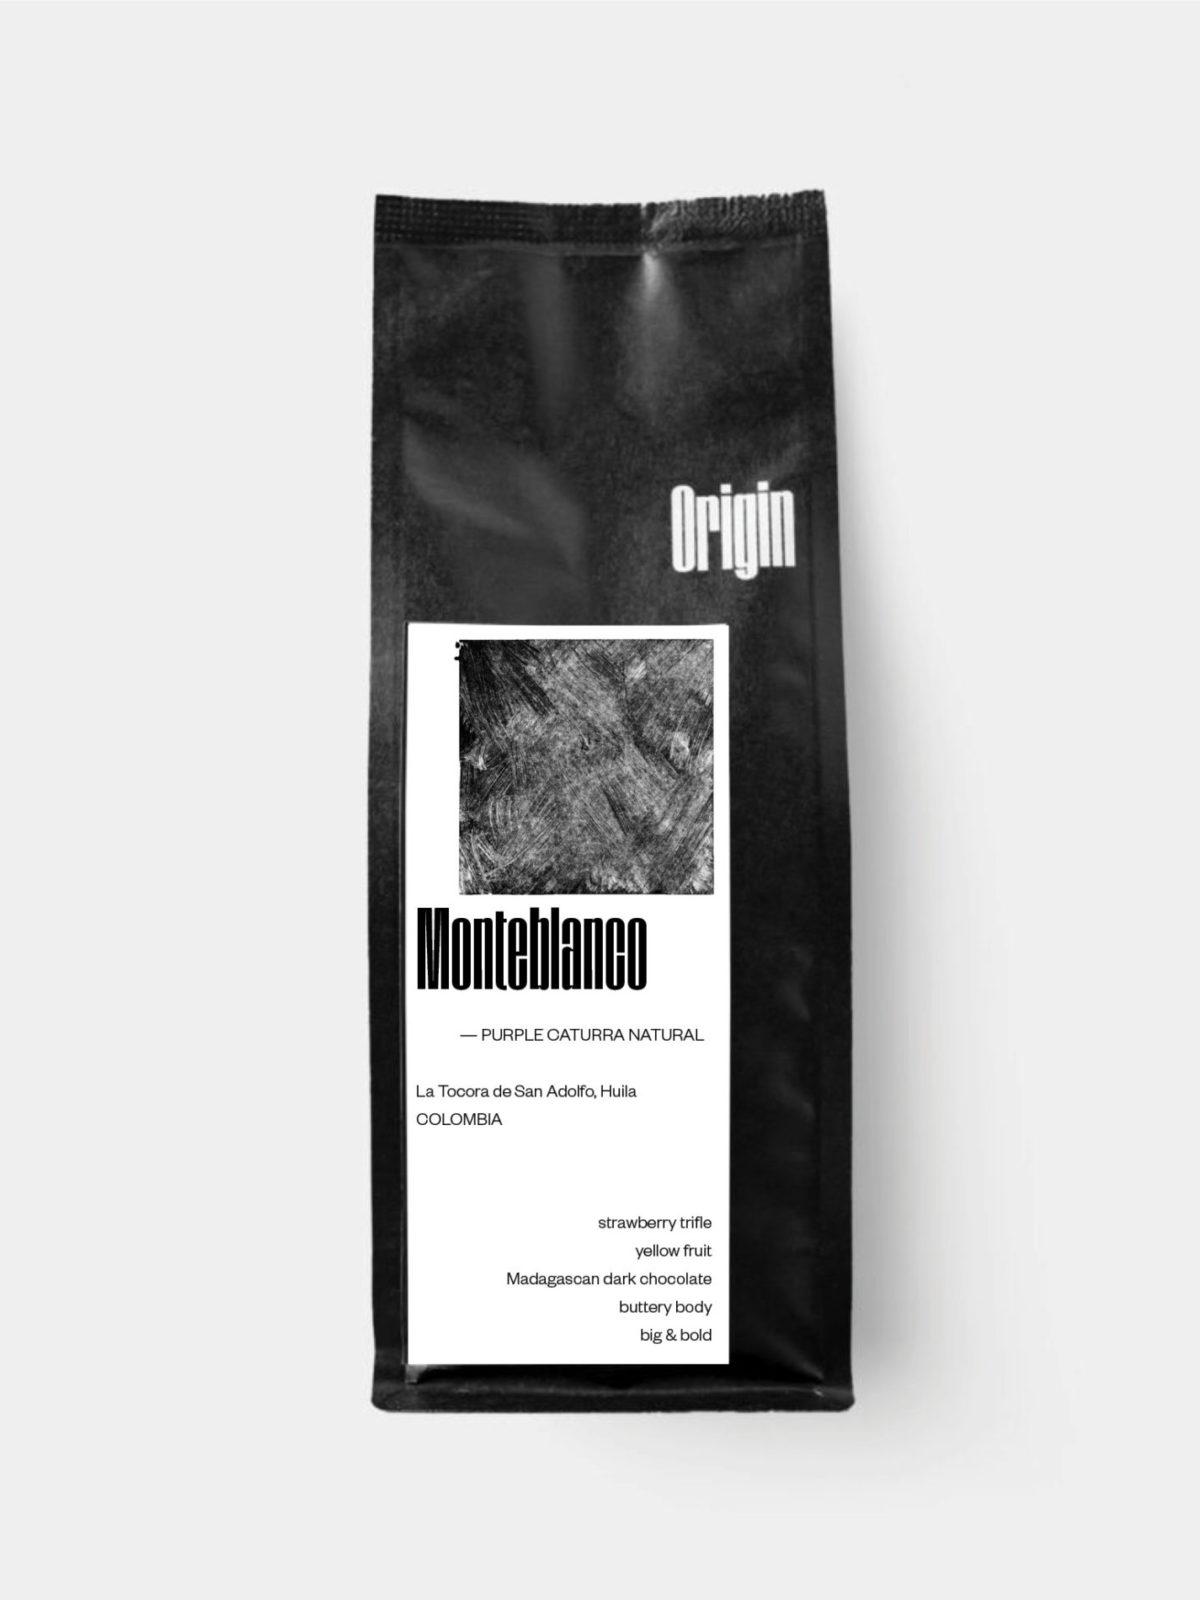 Colombia Monteblanco on the 250g bag